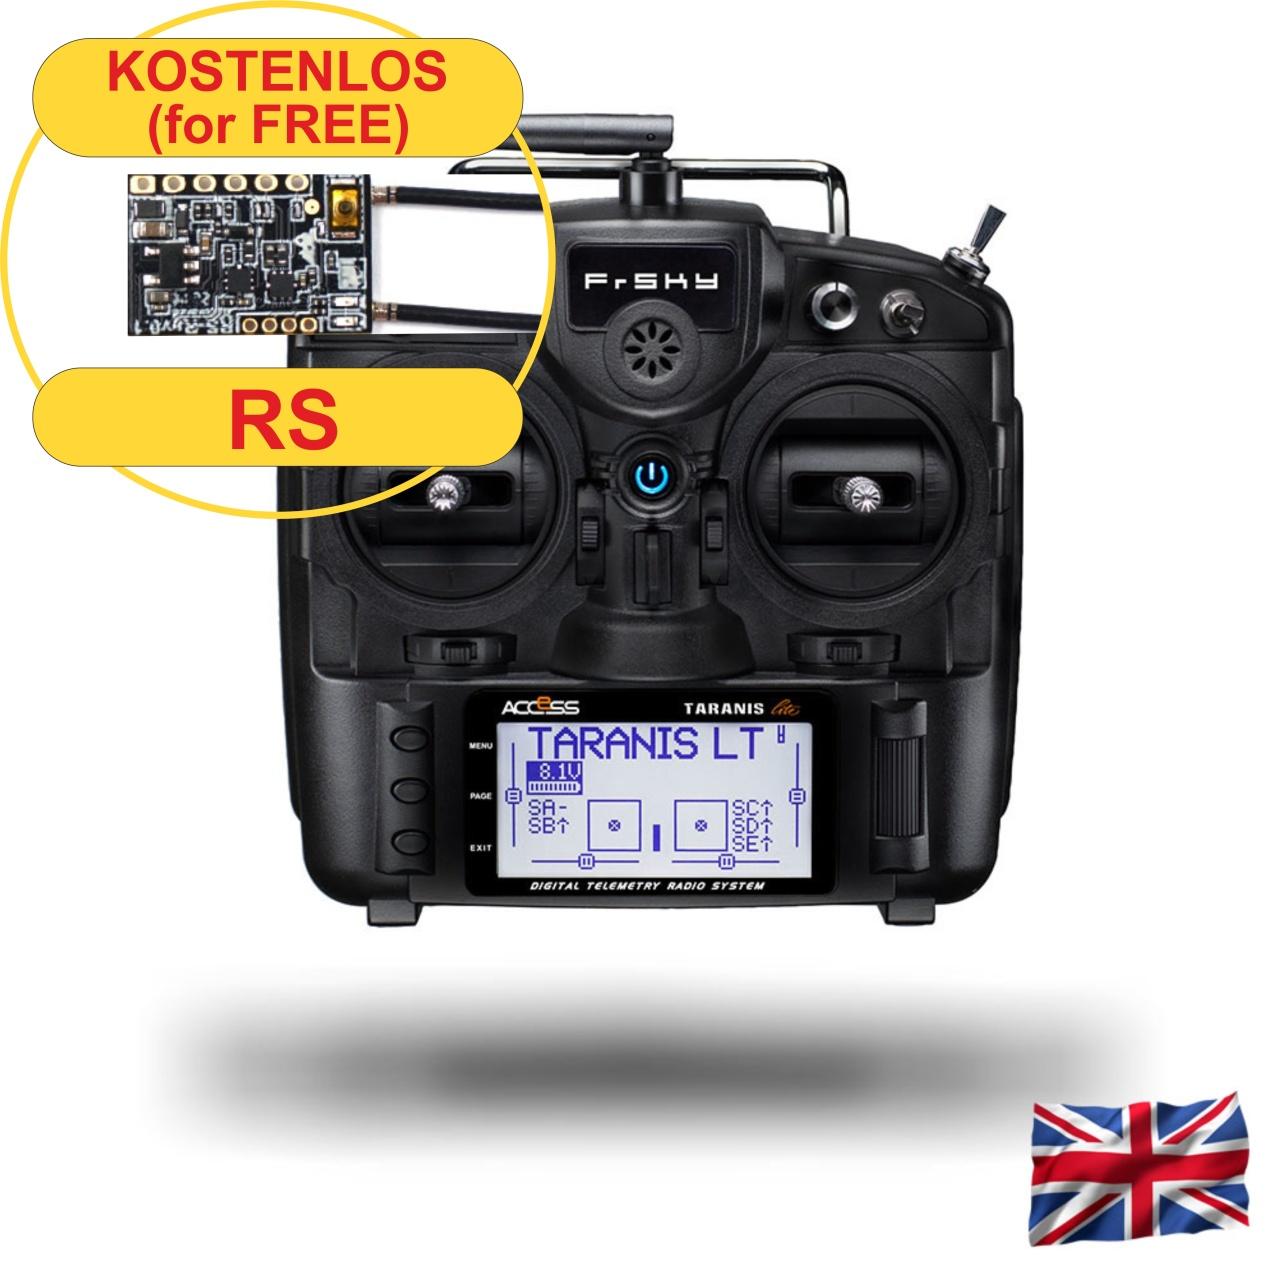 TARANIS X9 Lite EU/LBT FrSky transmitter black